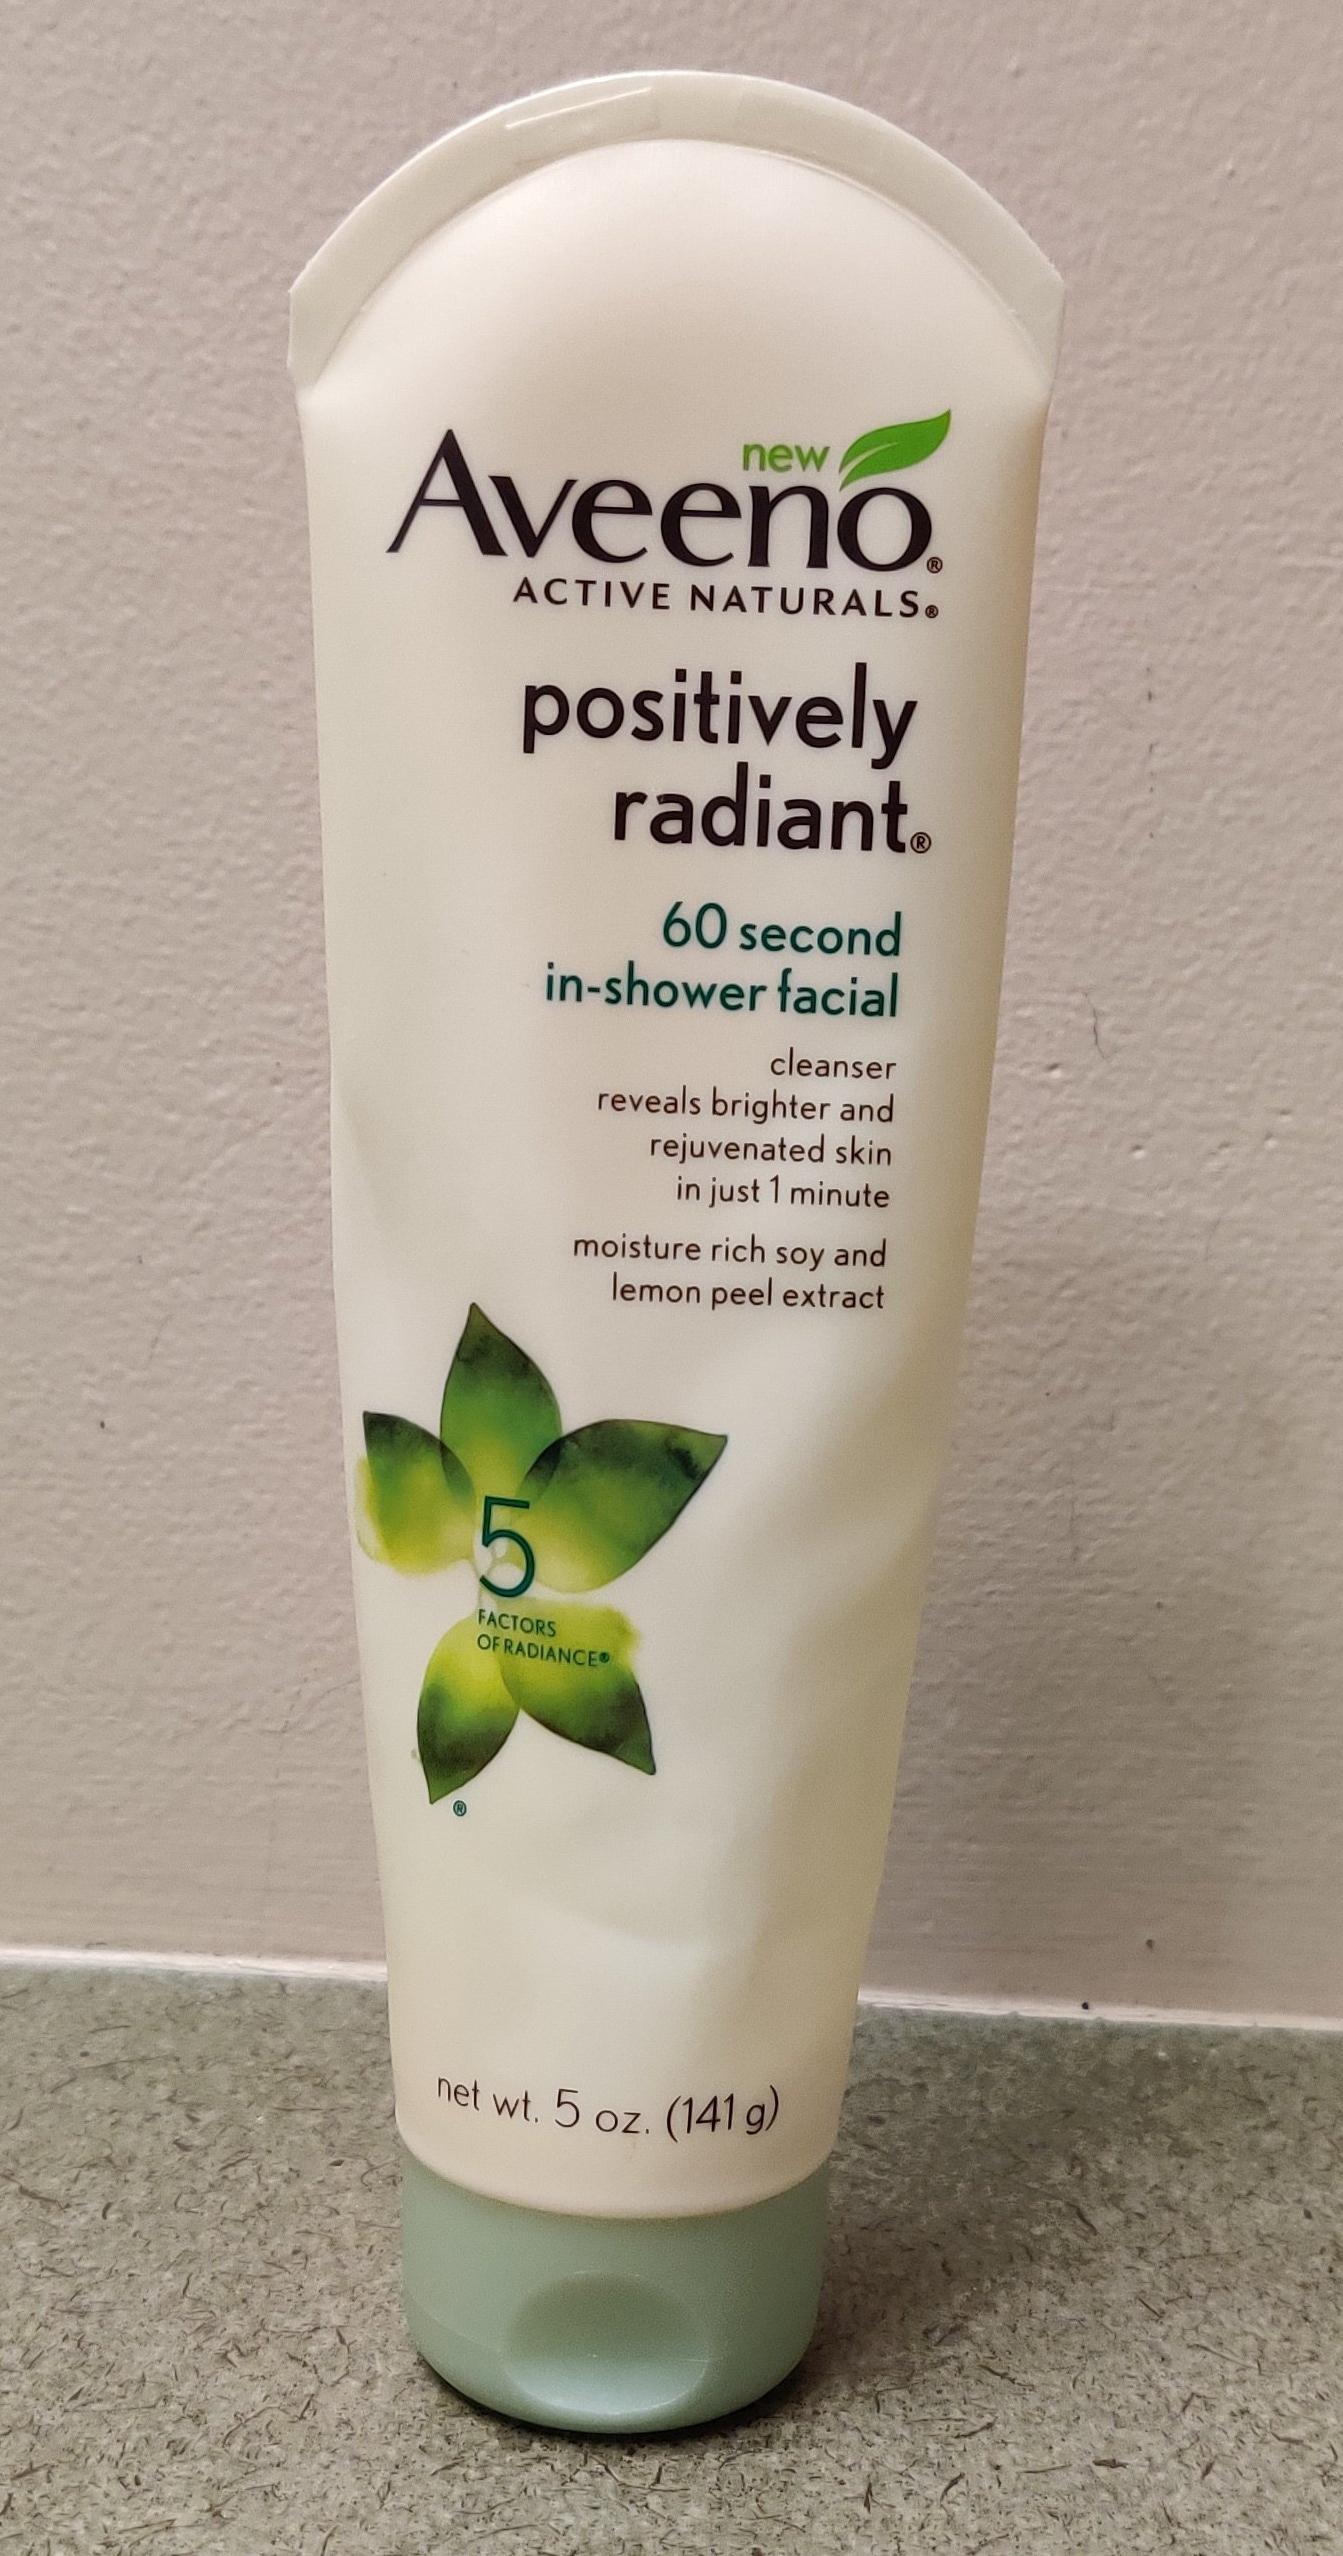 Aveeno positively radiant | lookingjoligood.blog